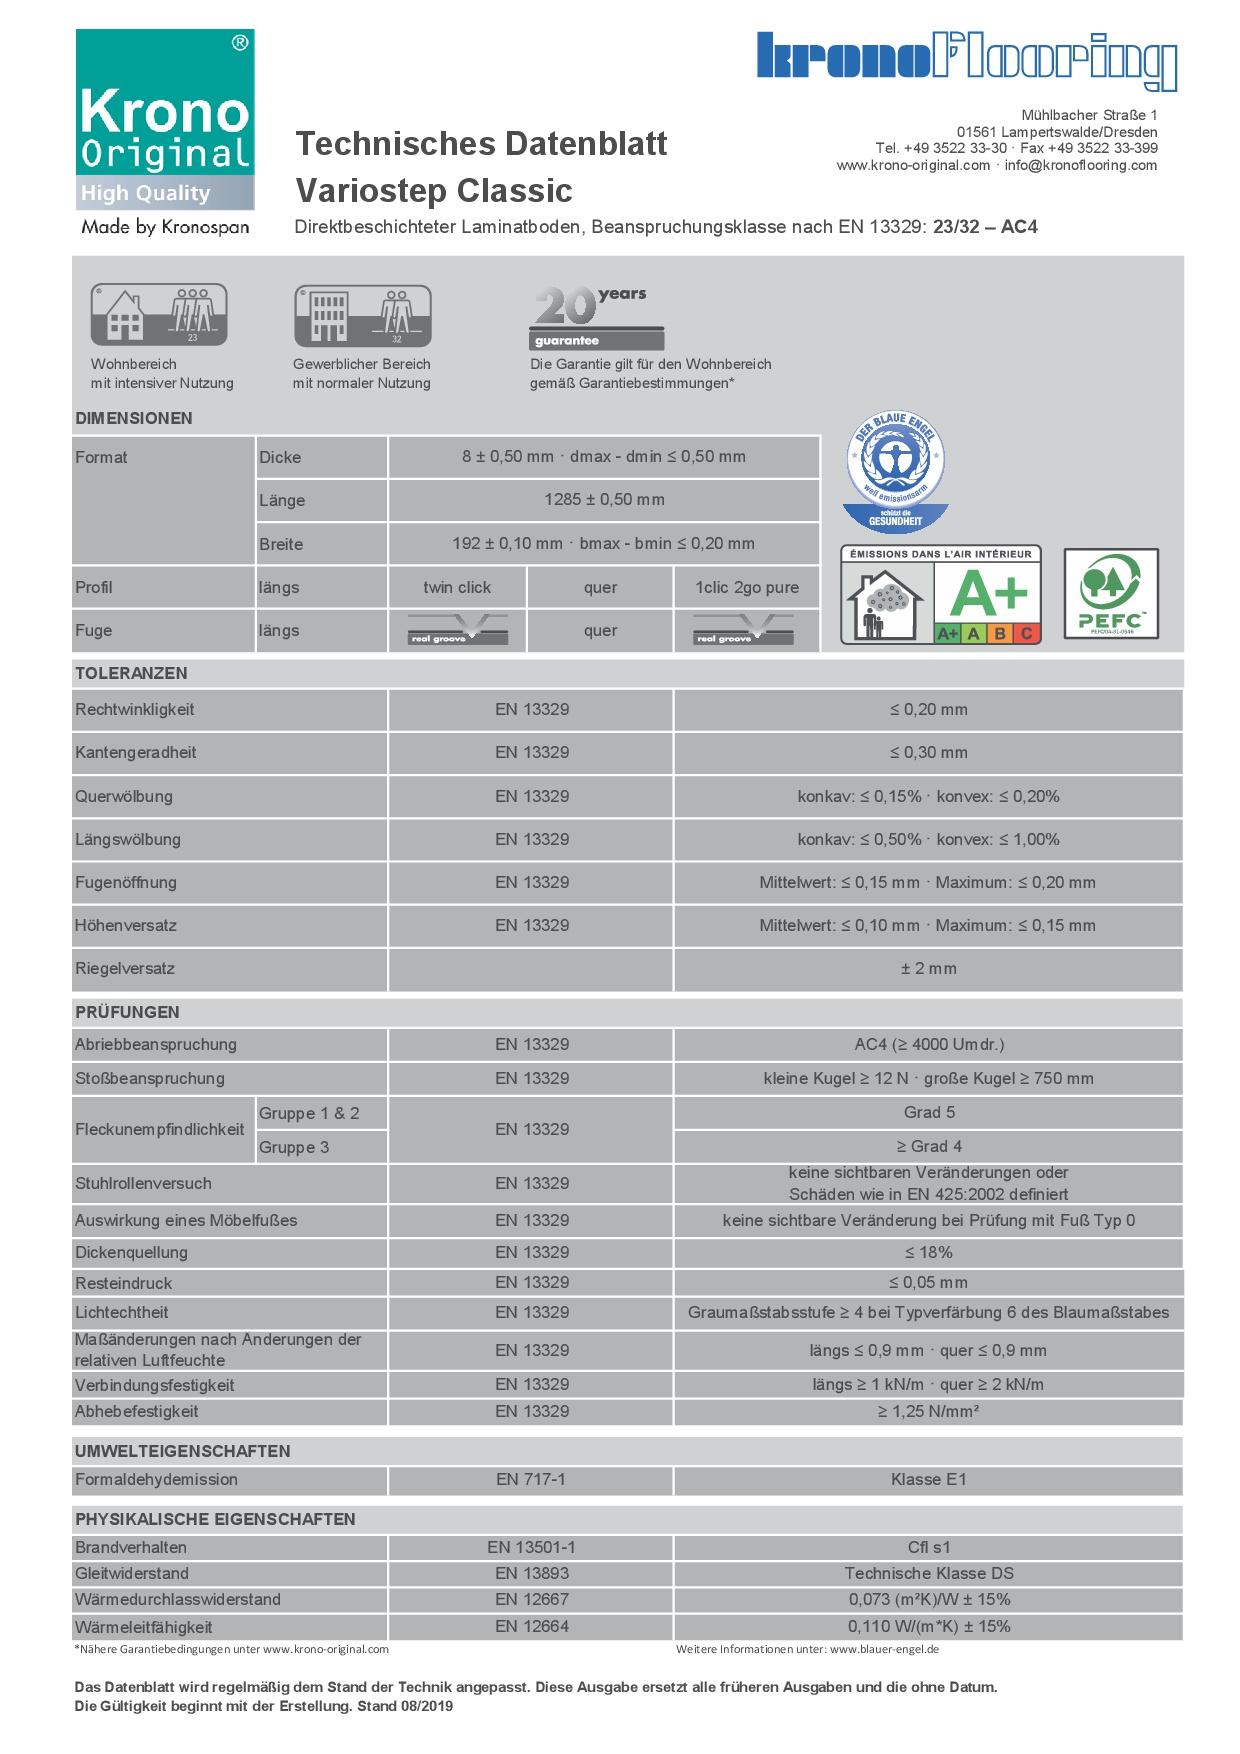 Technisches_Datenblatt_Variostep_Classic_dt_Pure